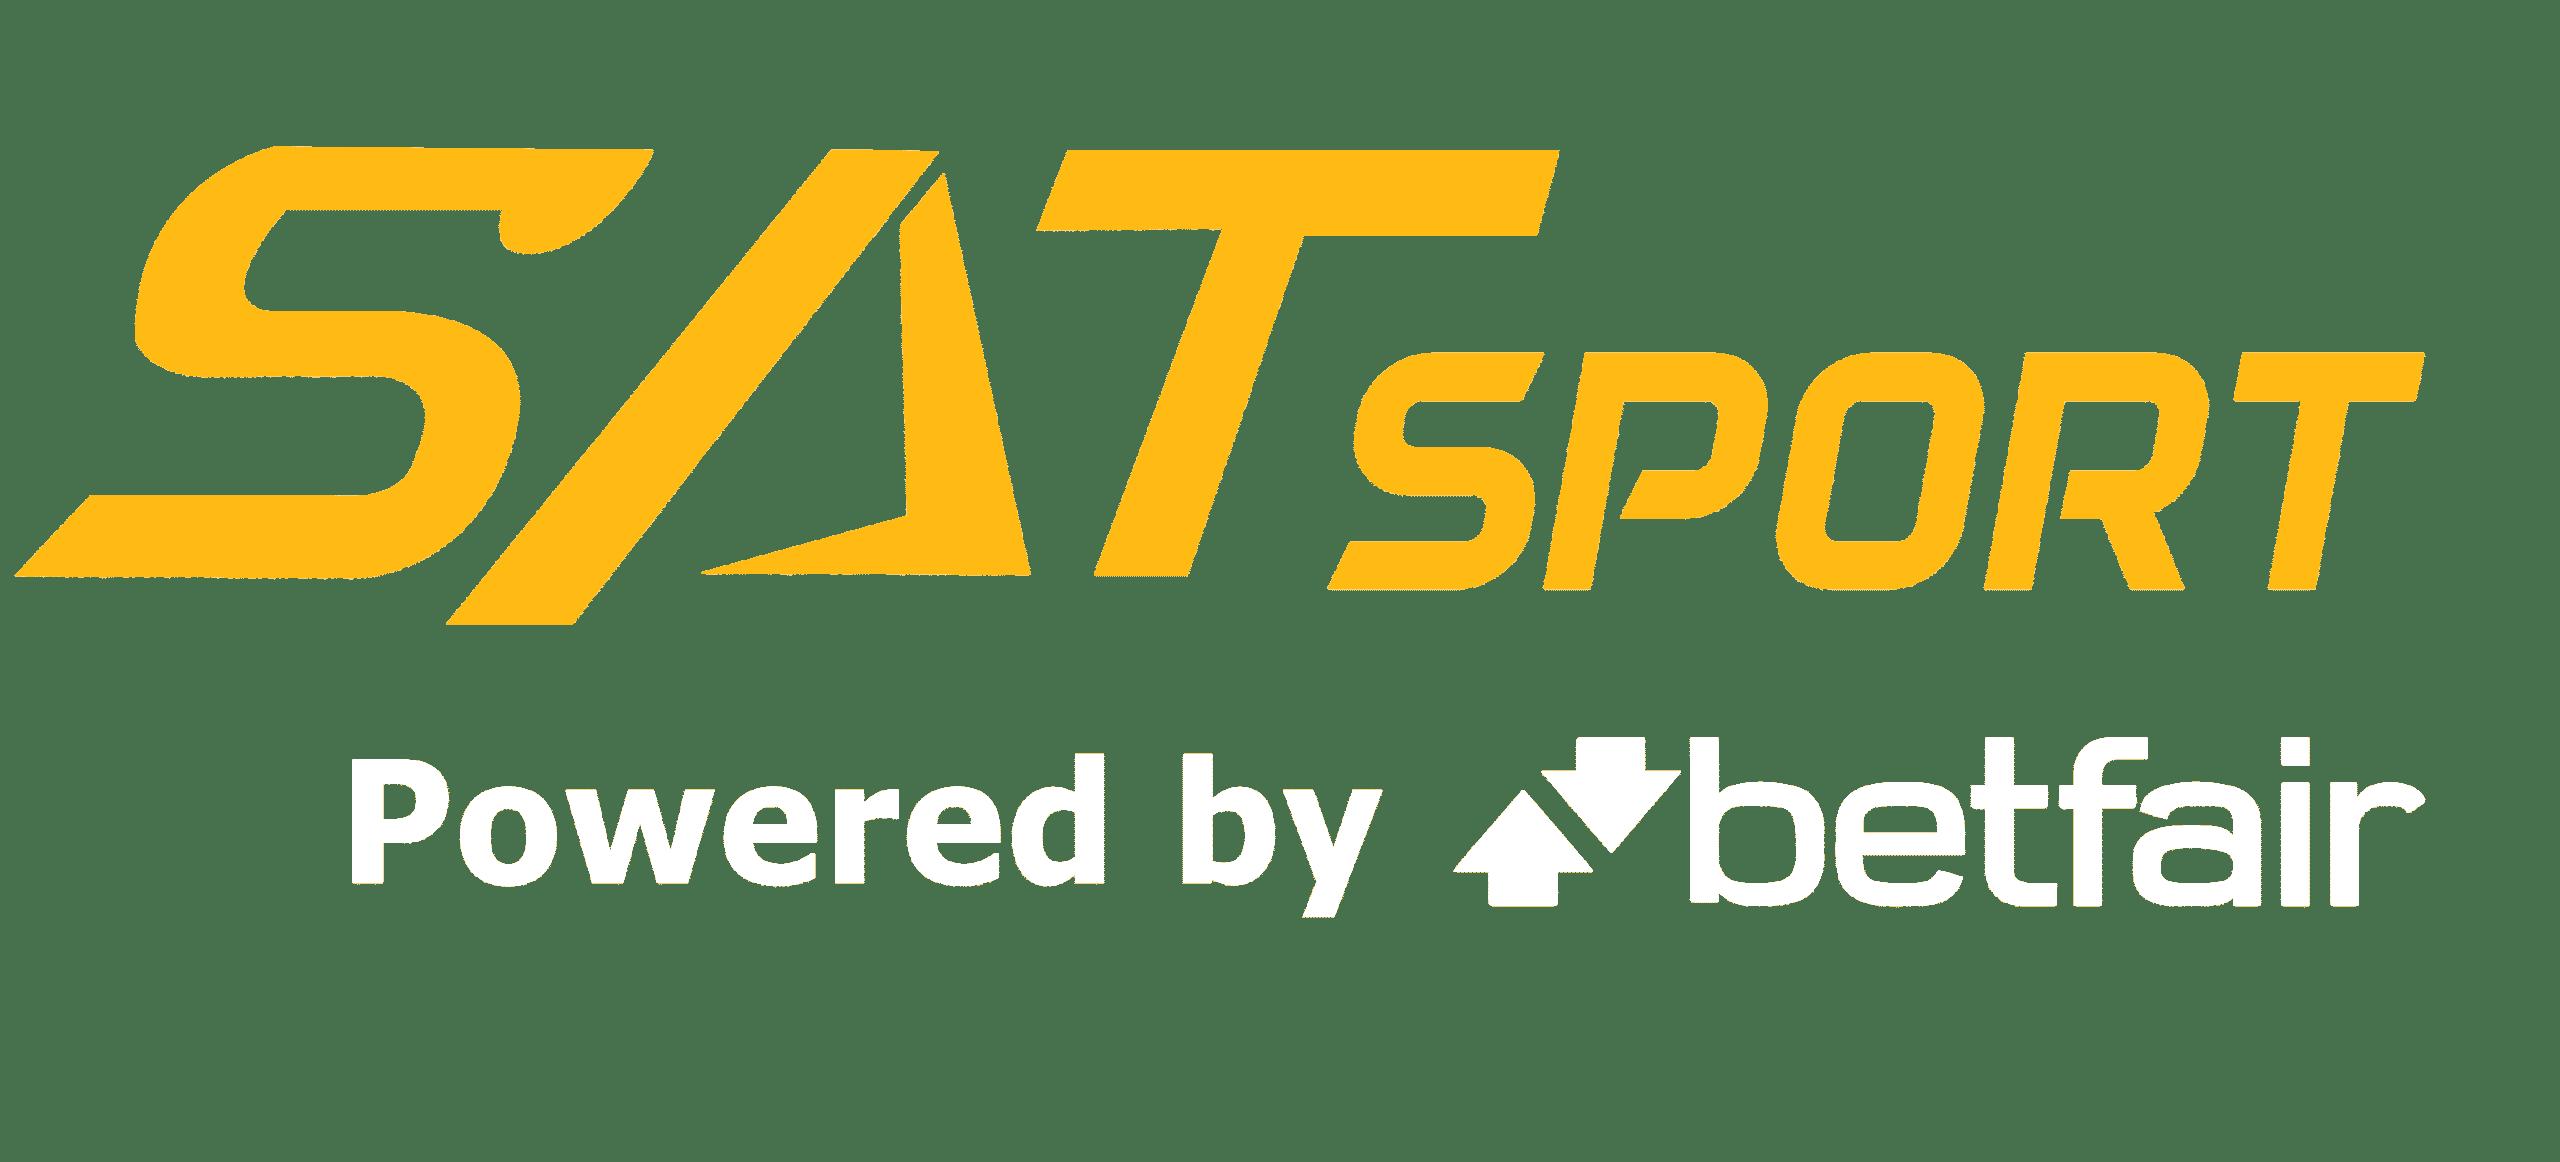 Satsport